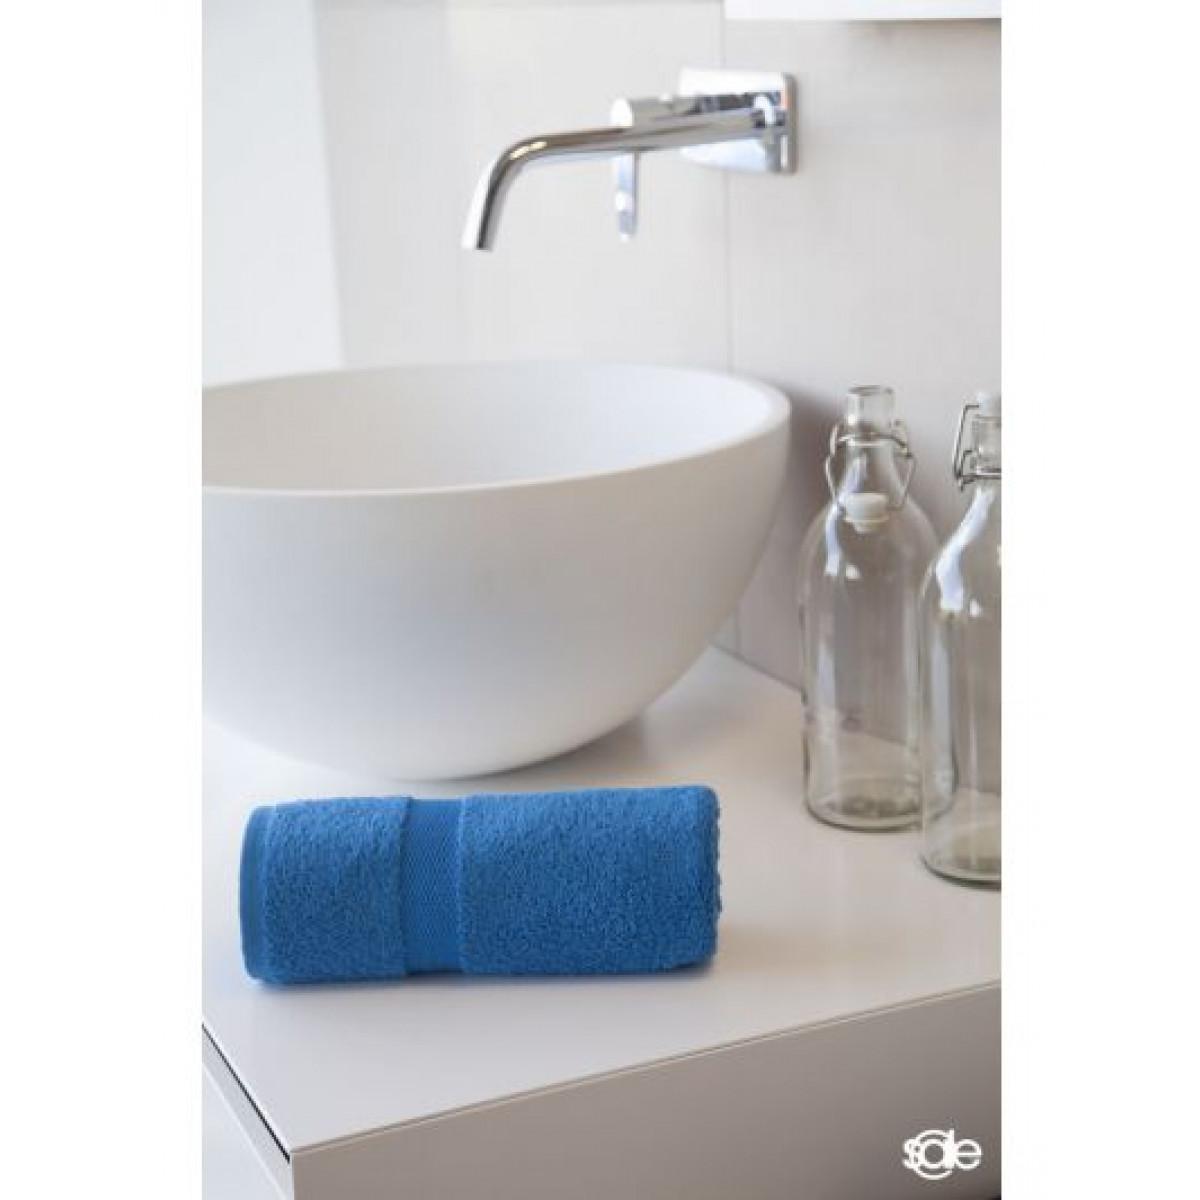 handdoek kobaltblauw